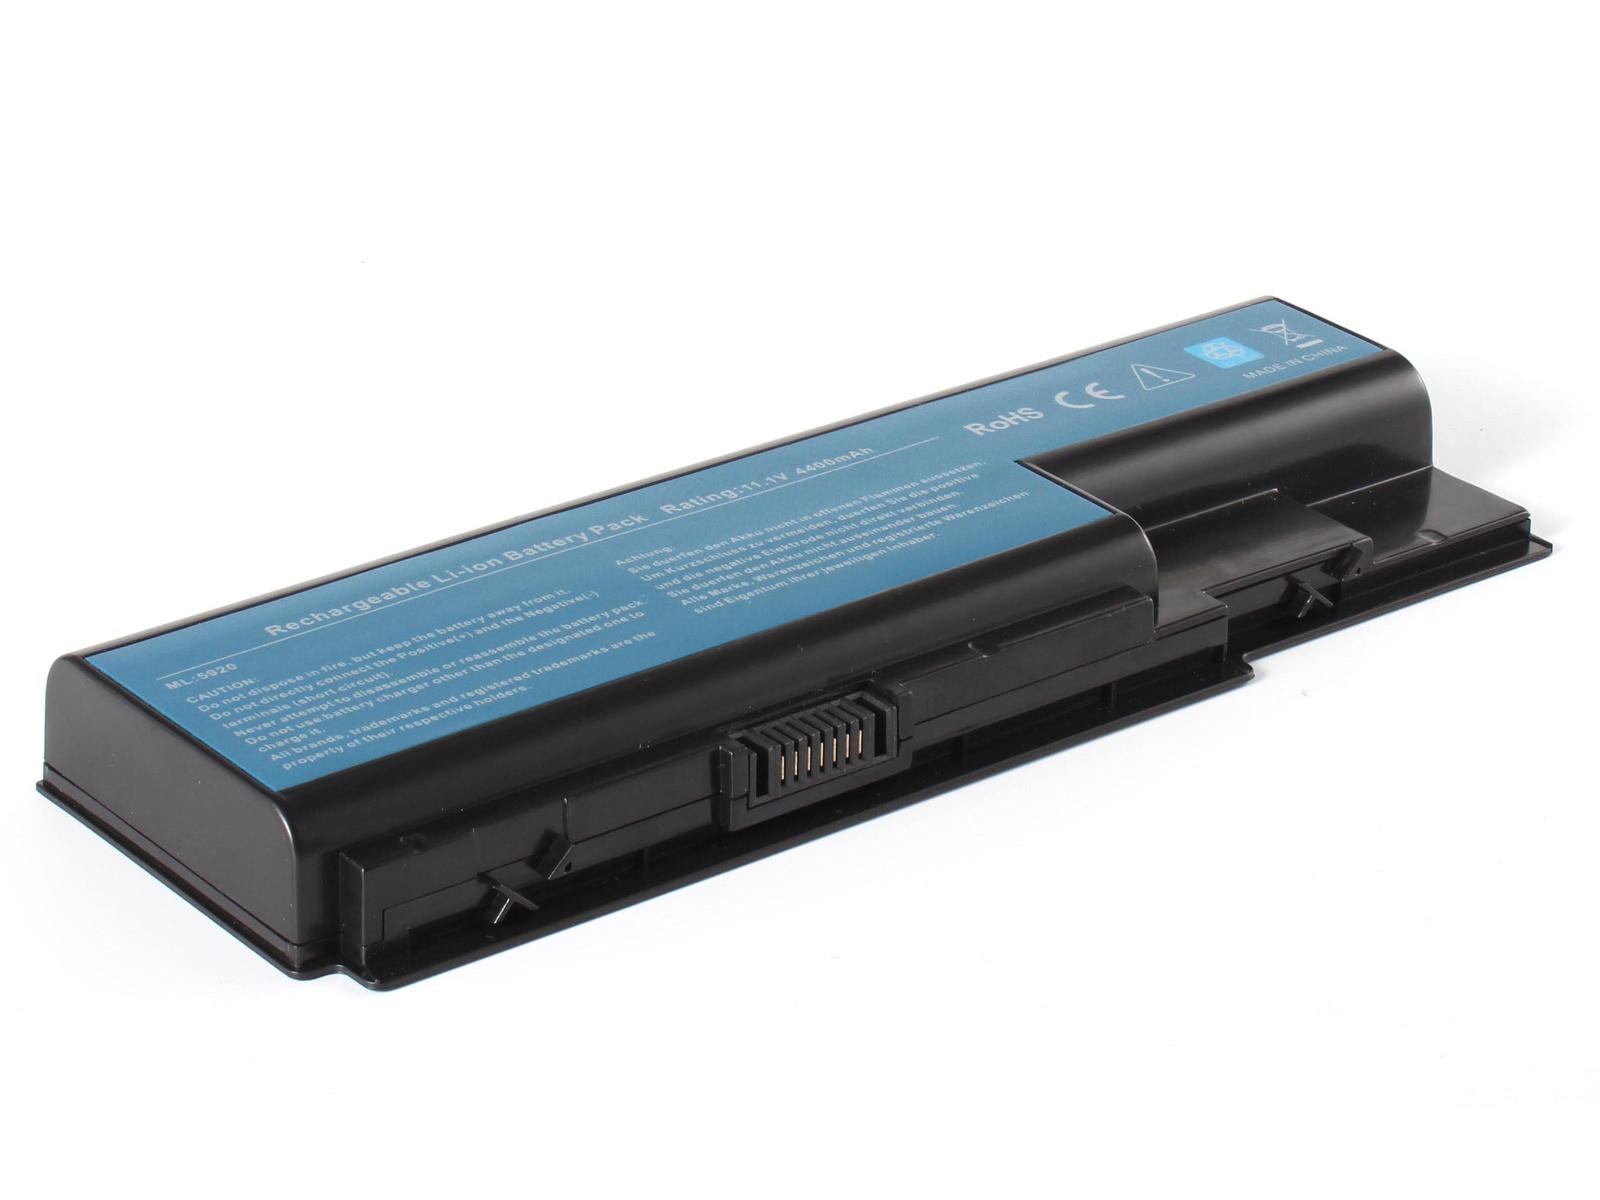 Аккумулятор для ноутбука AnyBatt для Acer Extensa 7630EZ-442G25Mi, Extensa 7630Z-423G25Mi, Aspire 5520G-502G16Mi, Aspire 5520G-503G25Mi, Aspire 5720G-1A1G16Mi, Aspire 5935G-664G32Mi, Aspire 5940G-724G50Wi, Aspire 5942G-728G64Bi блок питания palmexx 19v 3 42a для aspire one timelinex 1830 ferrari one travelmate extensa series pa 005